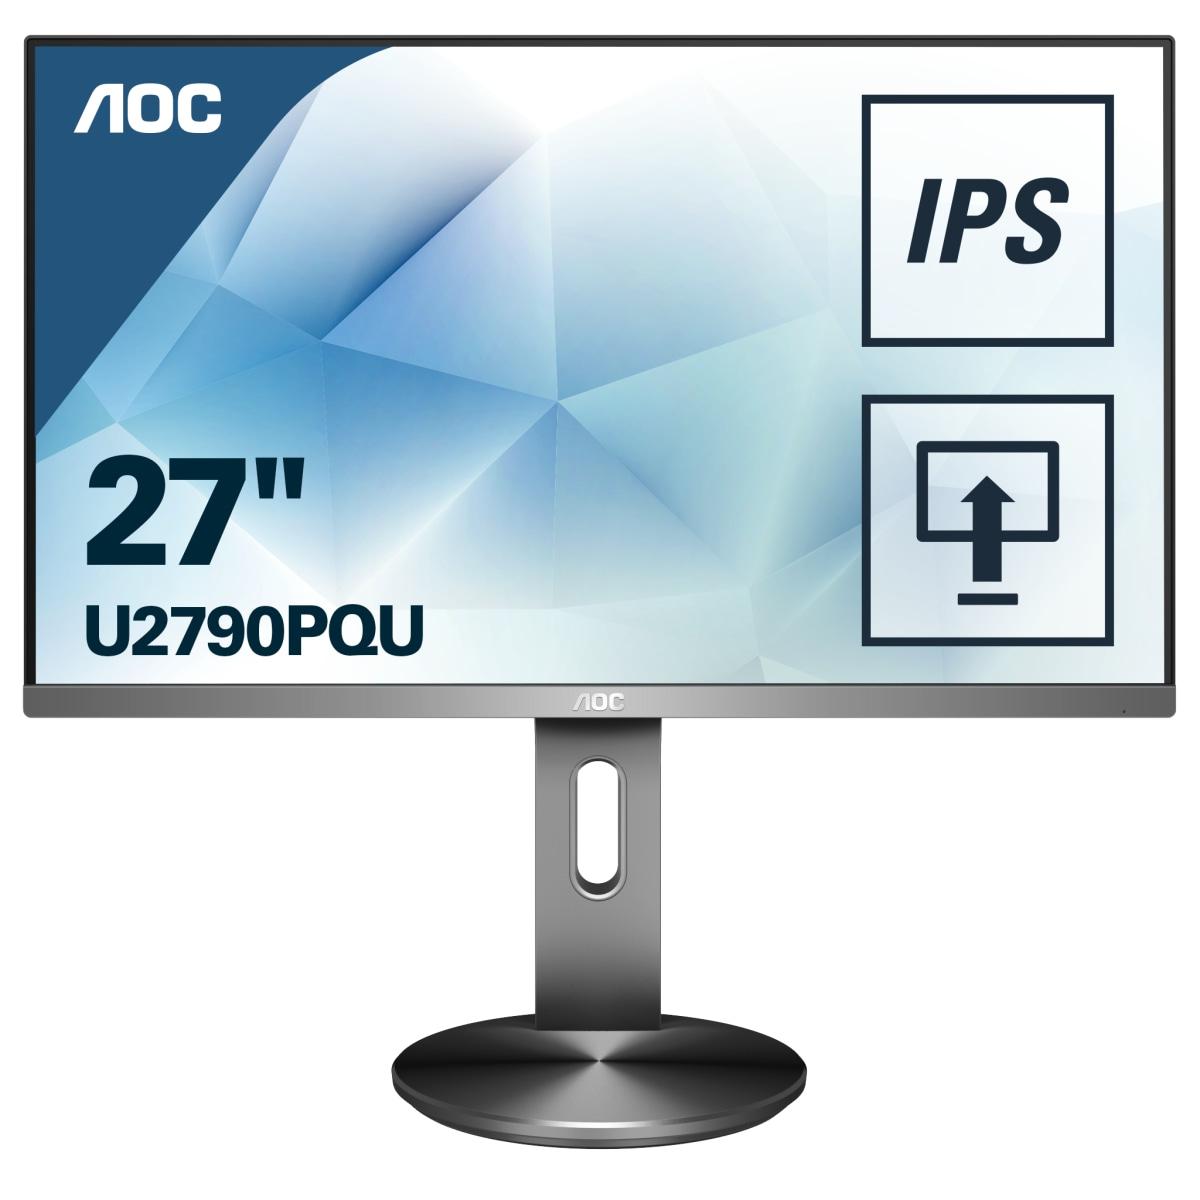 AOC Pro-line U2790PQU computer monitor 68.6 cm (27